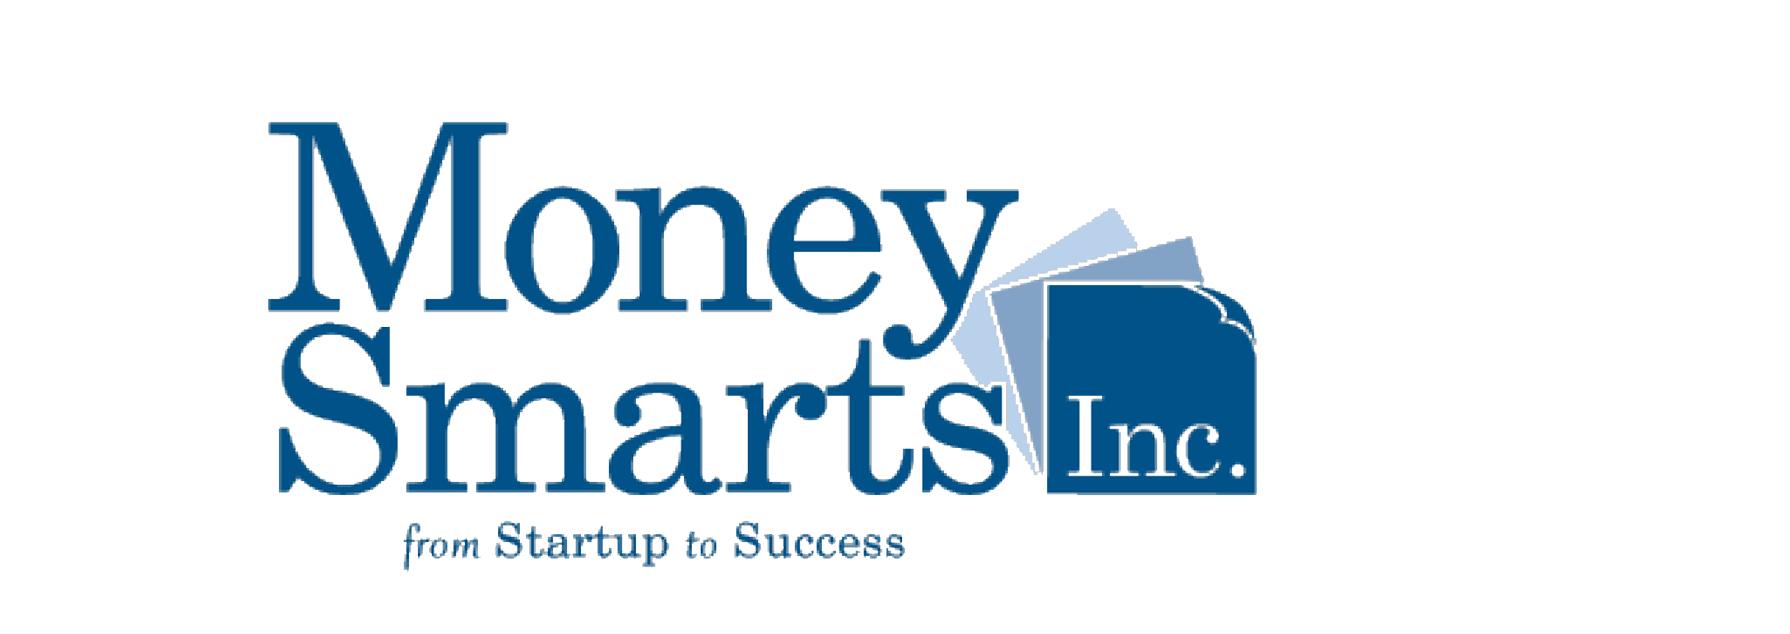 MoneySmarts Inc.